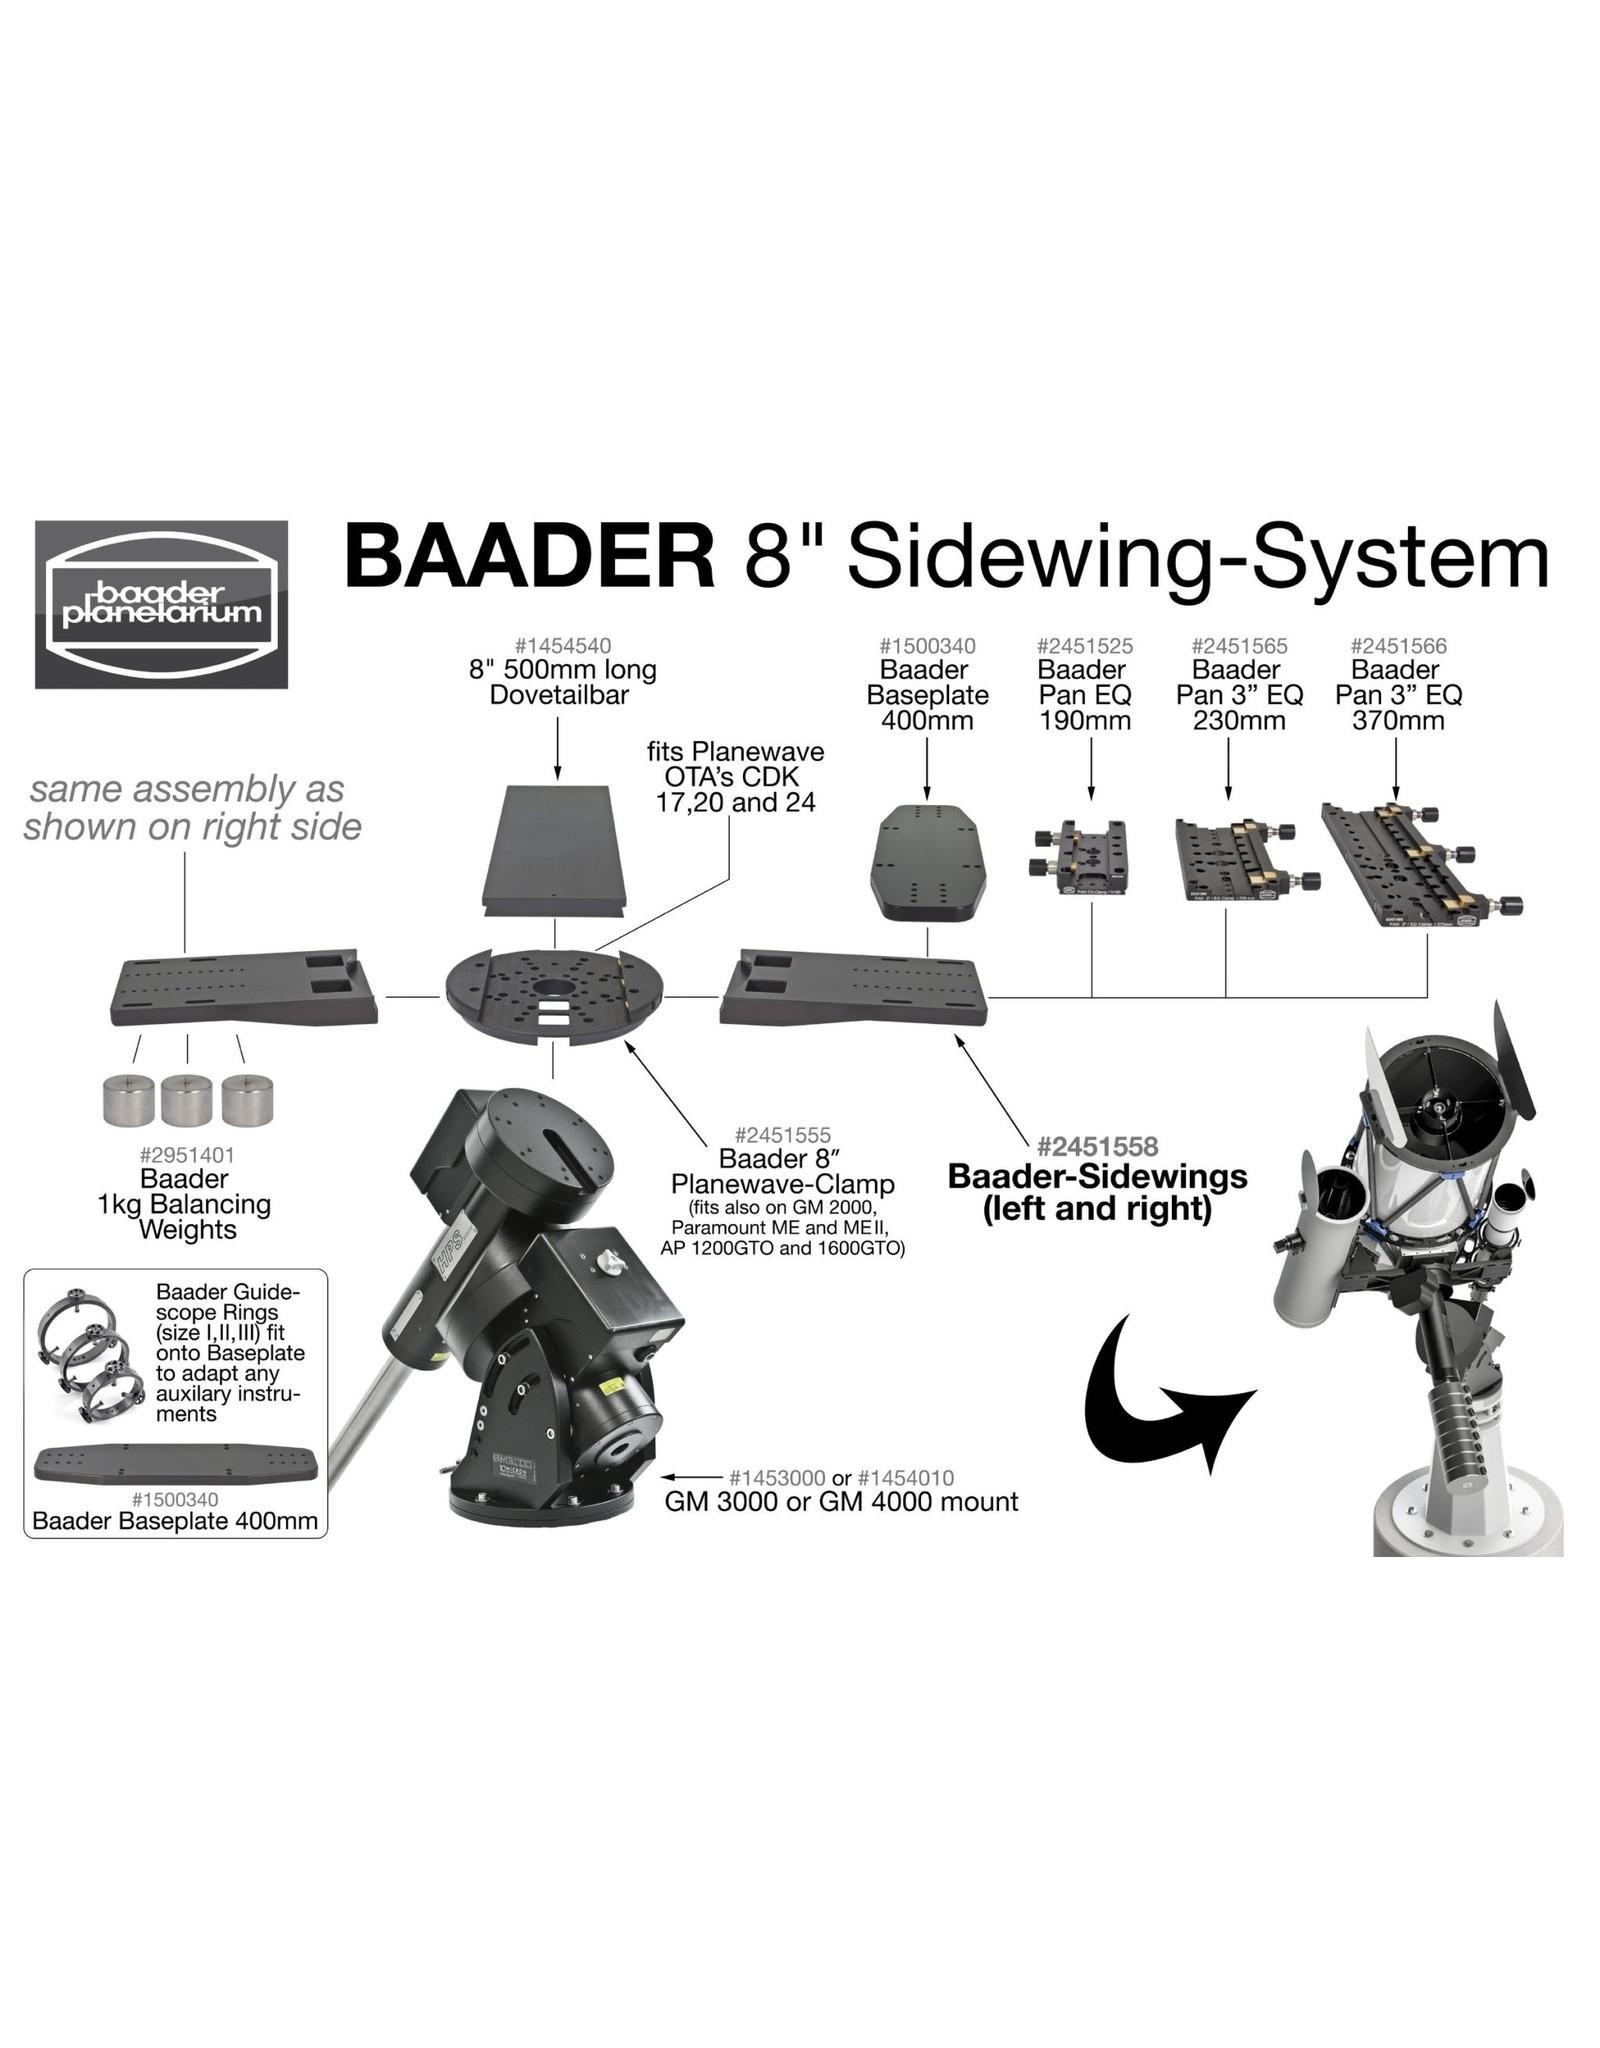 Baader Planetarium Baader Guidescope Rings BP III - 140-185mm